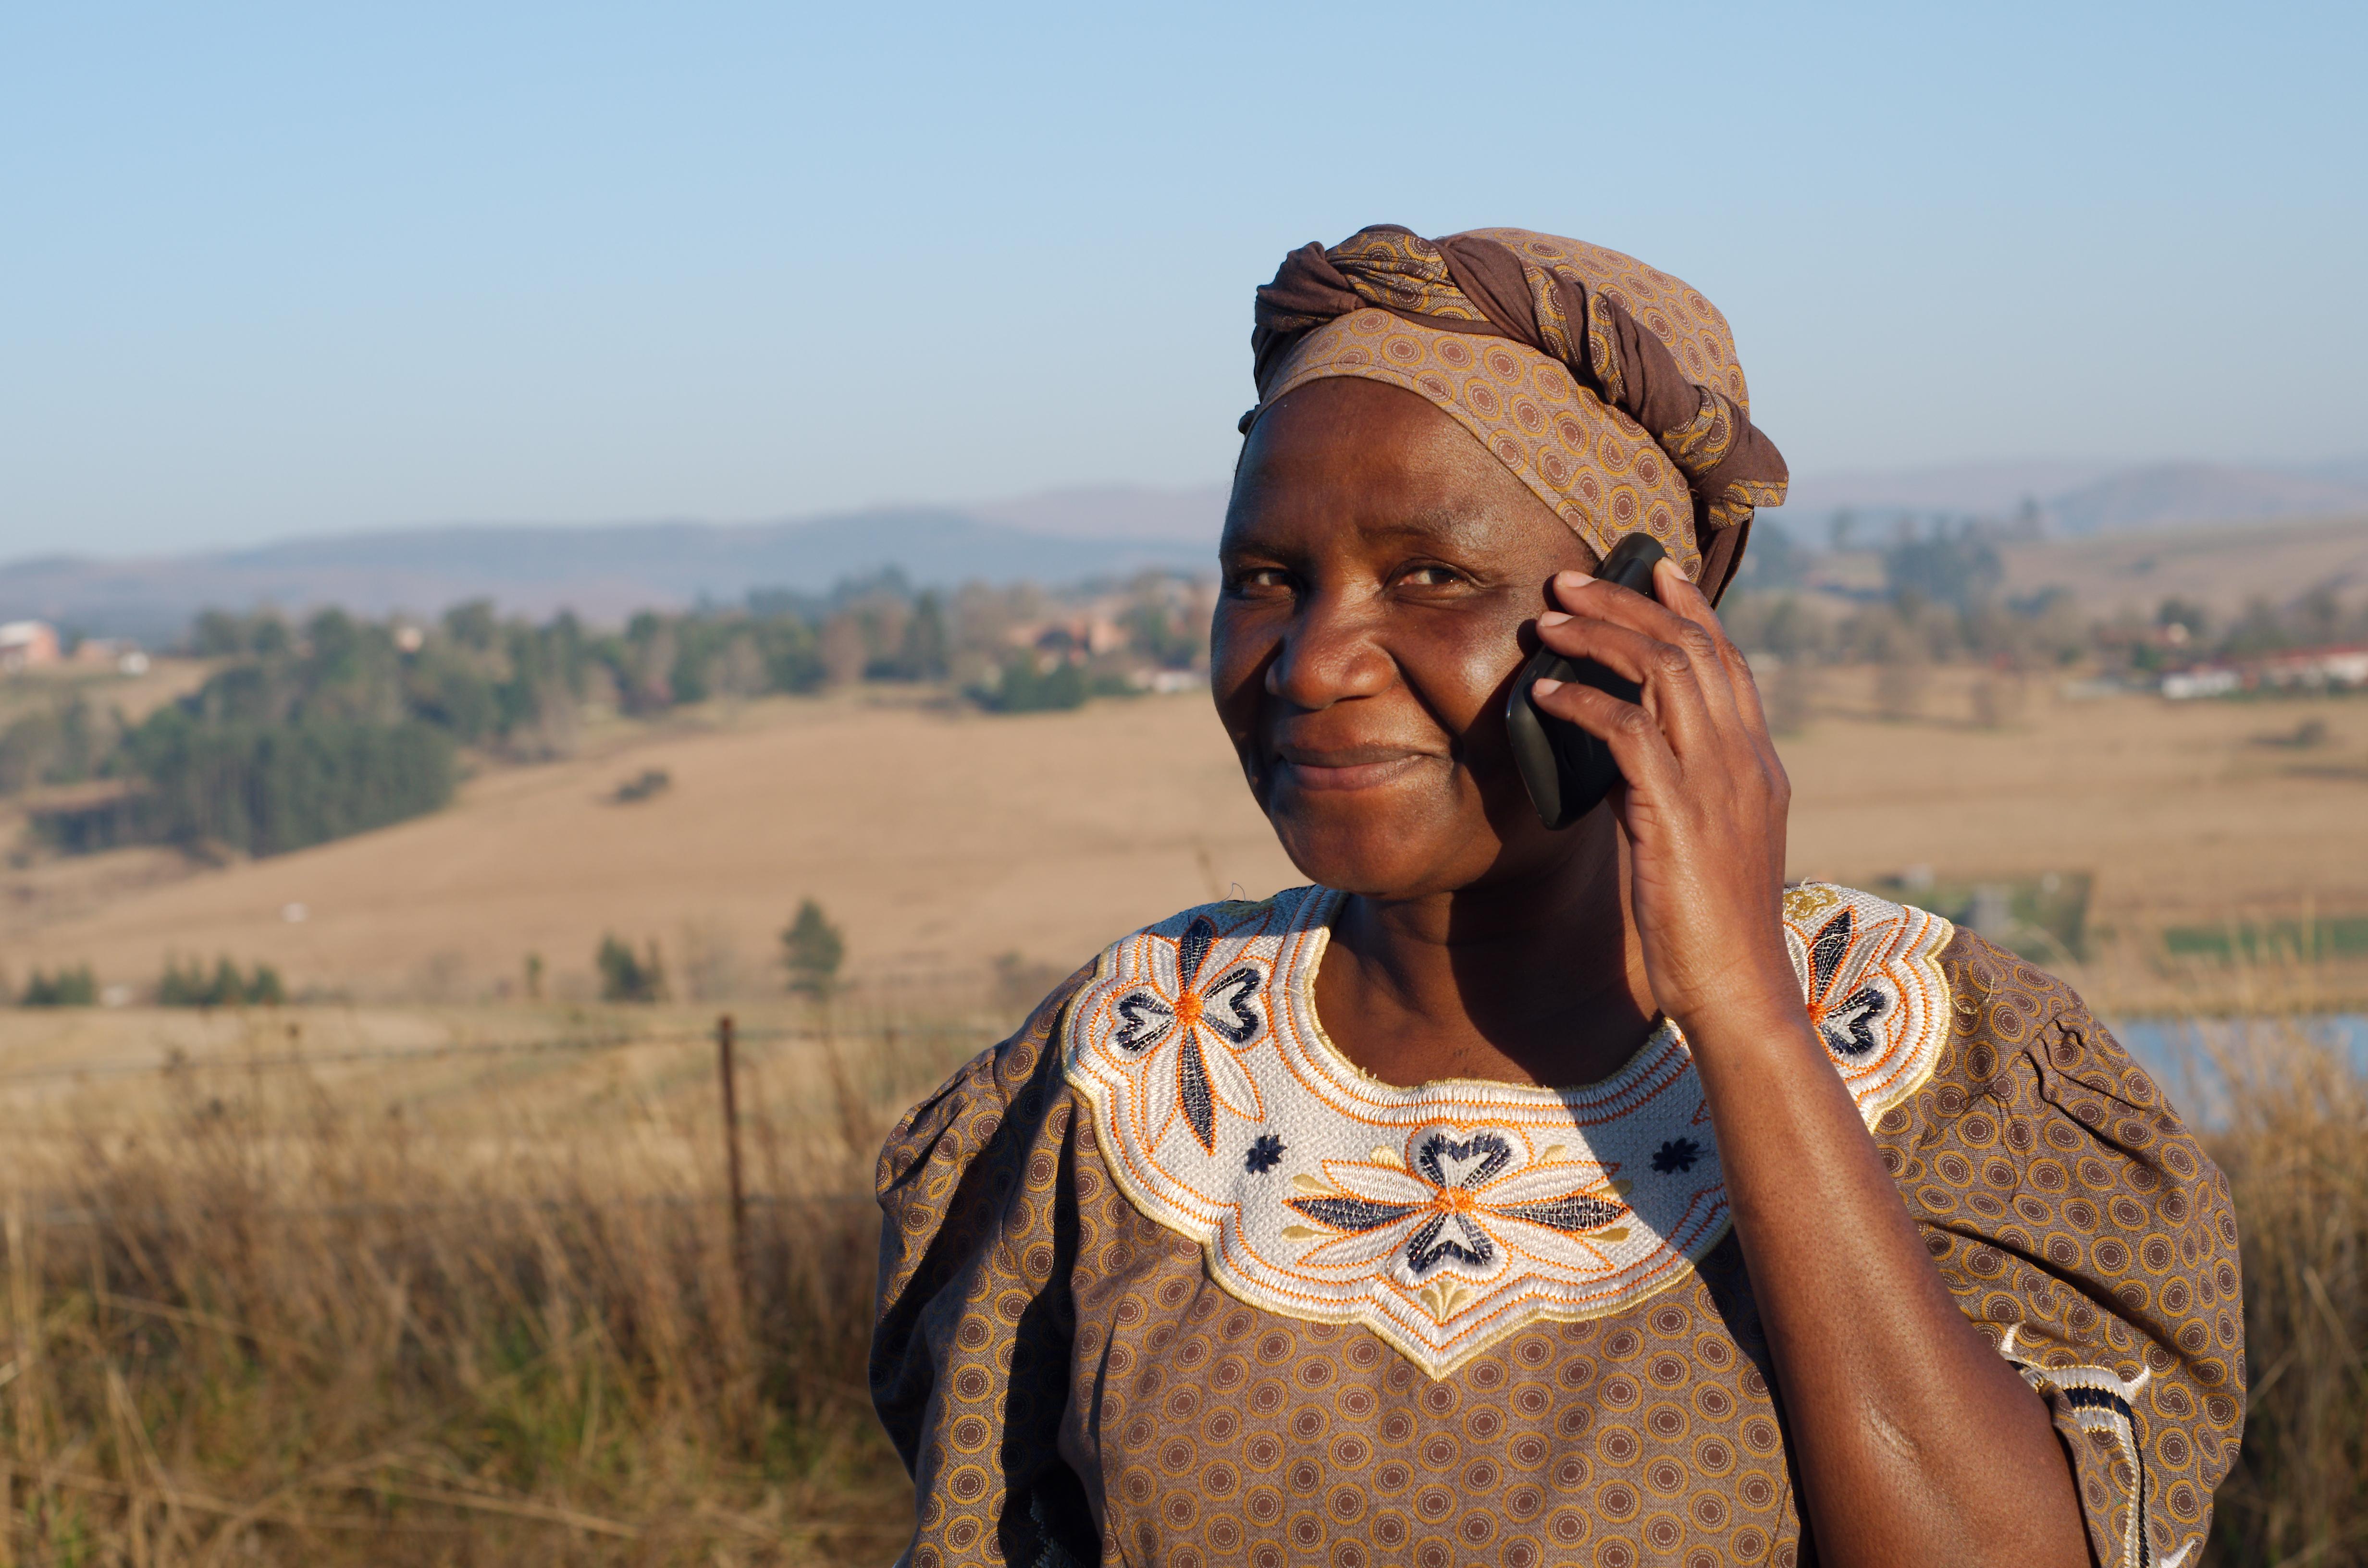 © Photo Africa / Shutterstock